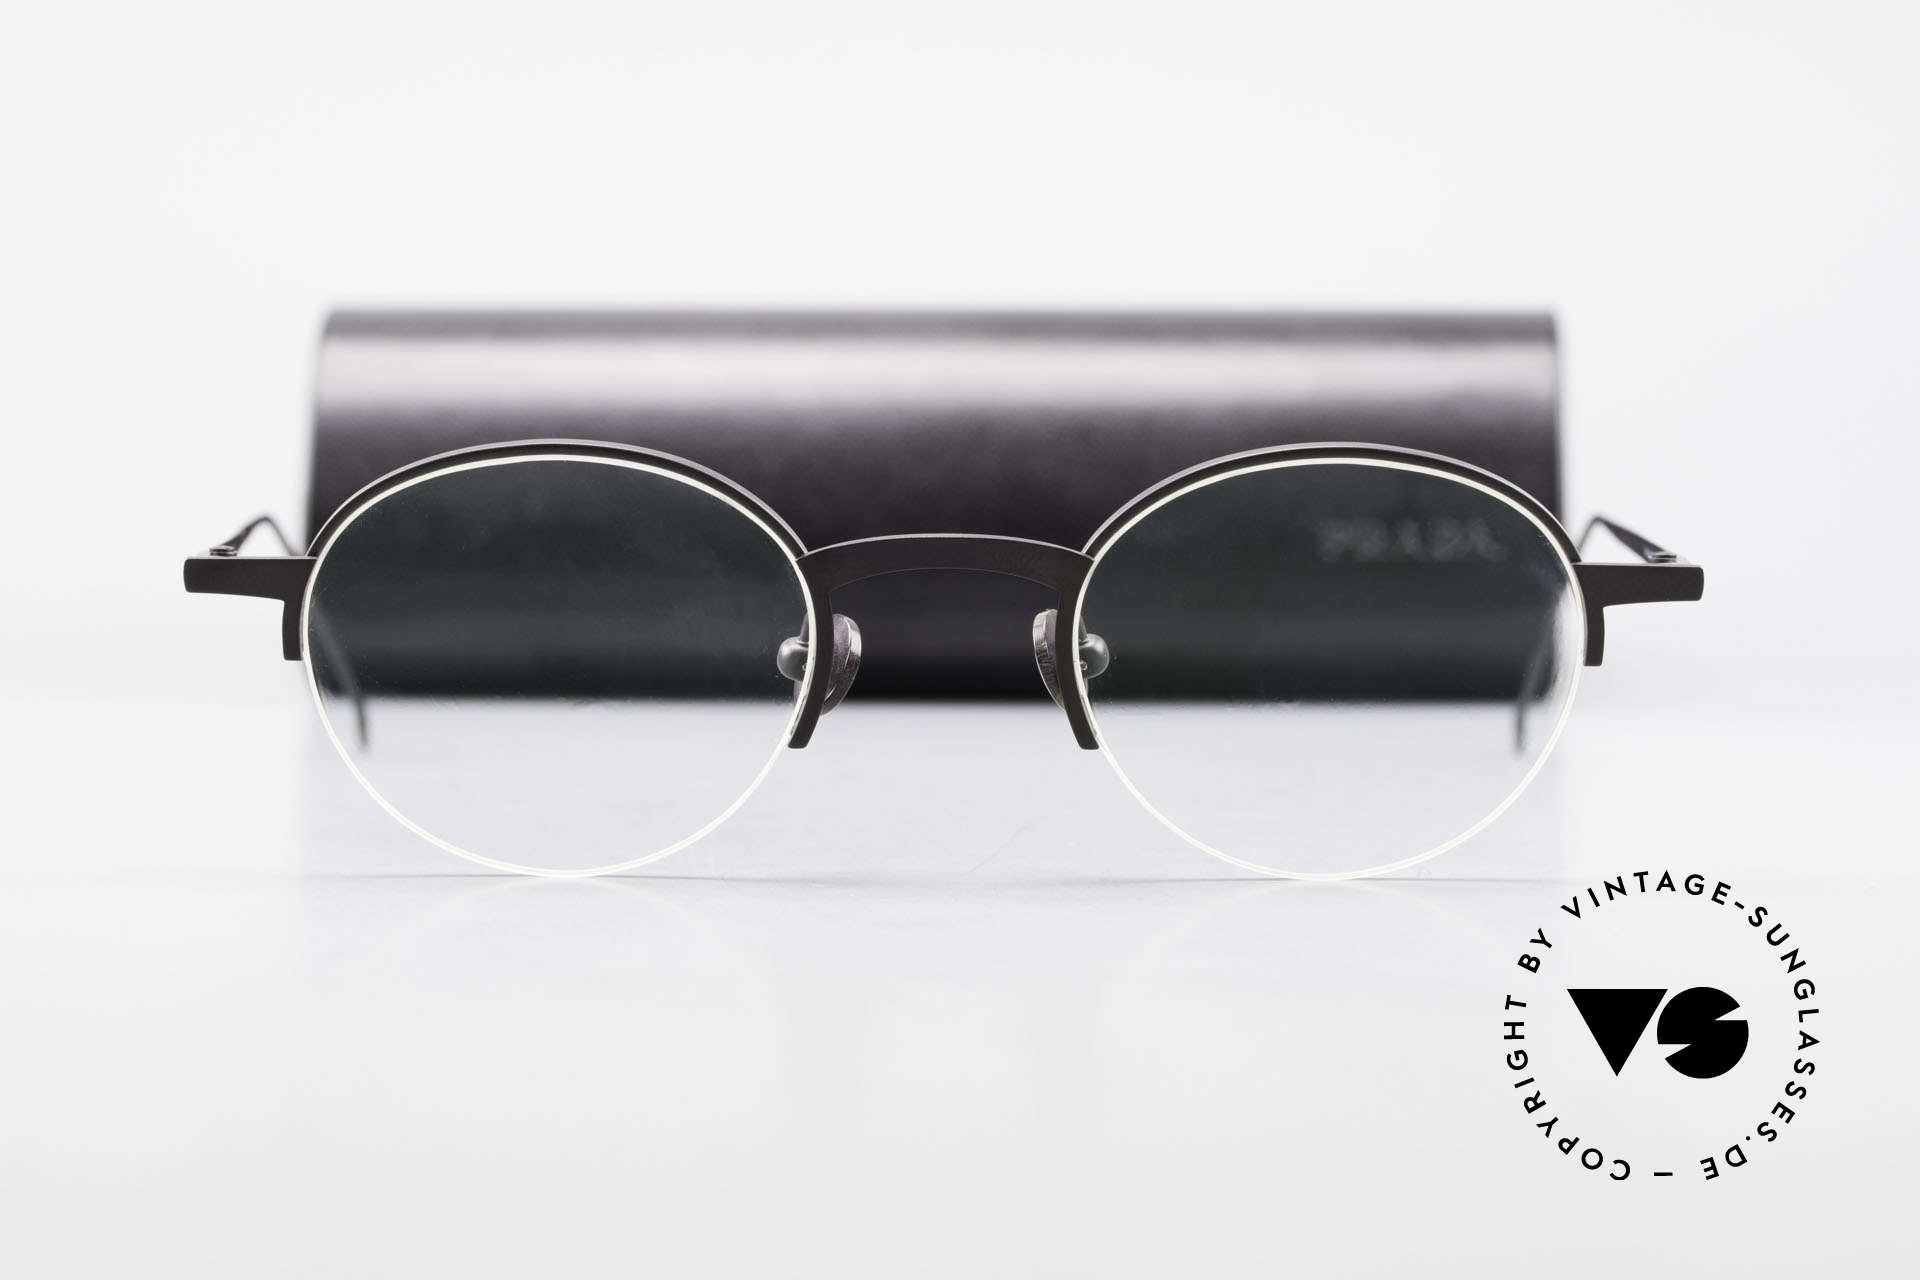 Markus Marienfeld Sina Pure Titanium Frame Handmade, Size: medium, Made for Men and Women